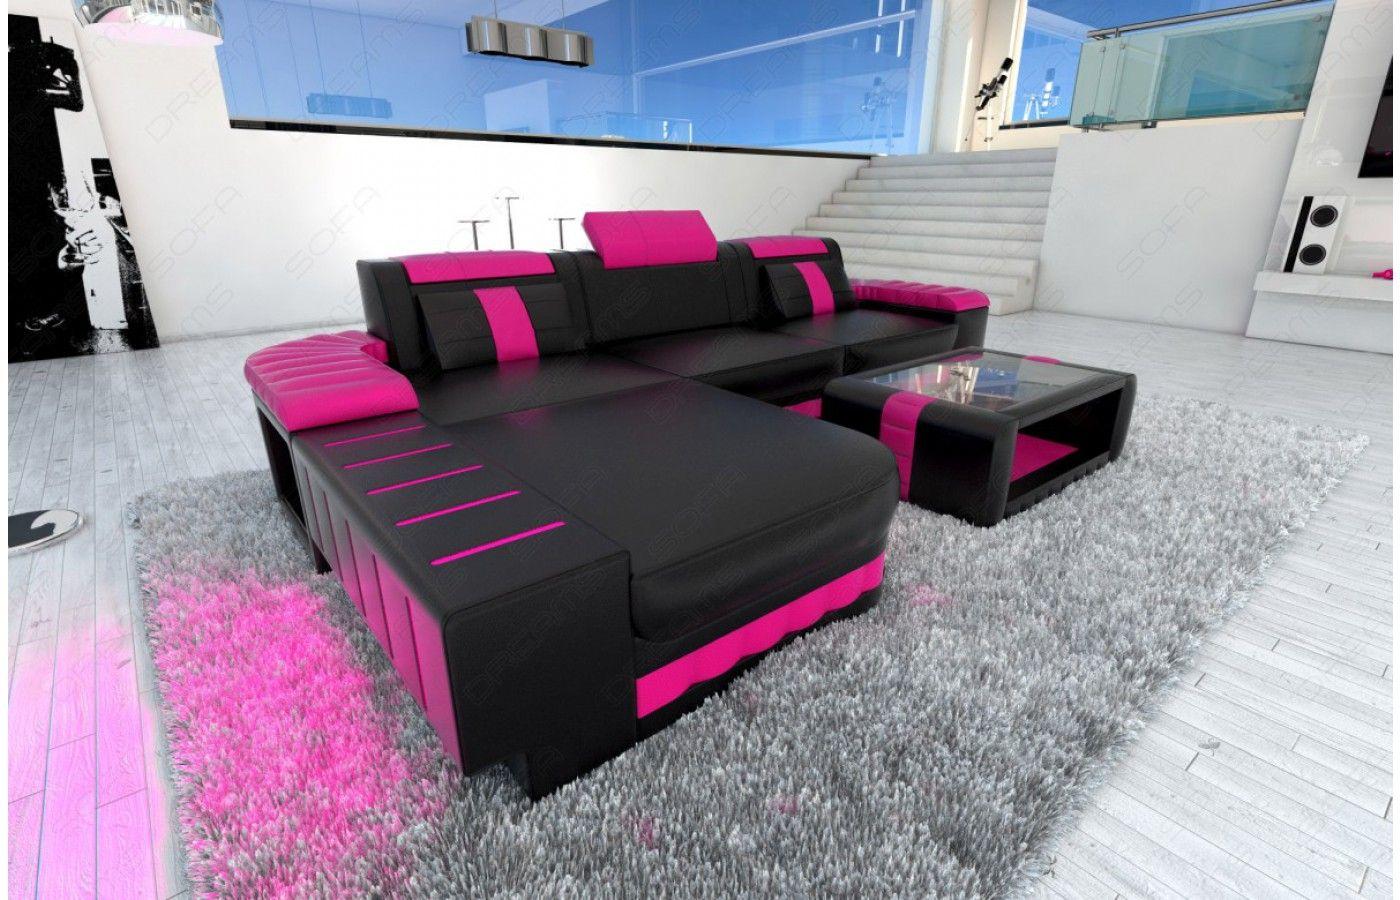 Designersofa BELLAGIO LED L Form In Beige Weiß   Exklusiv Bei Sofa Dreams |  Designersofa BELLAGIO LED L Form | Pinterest